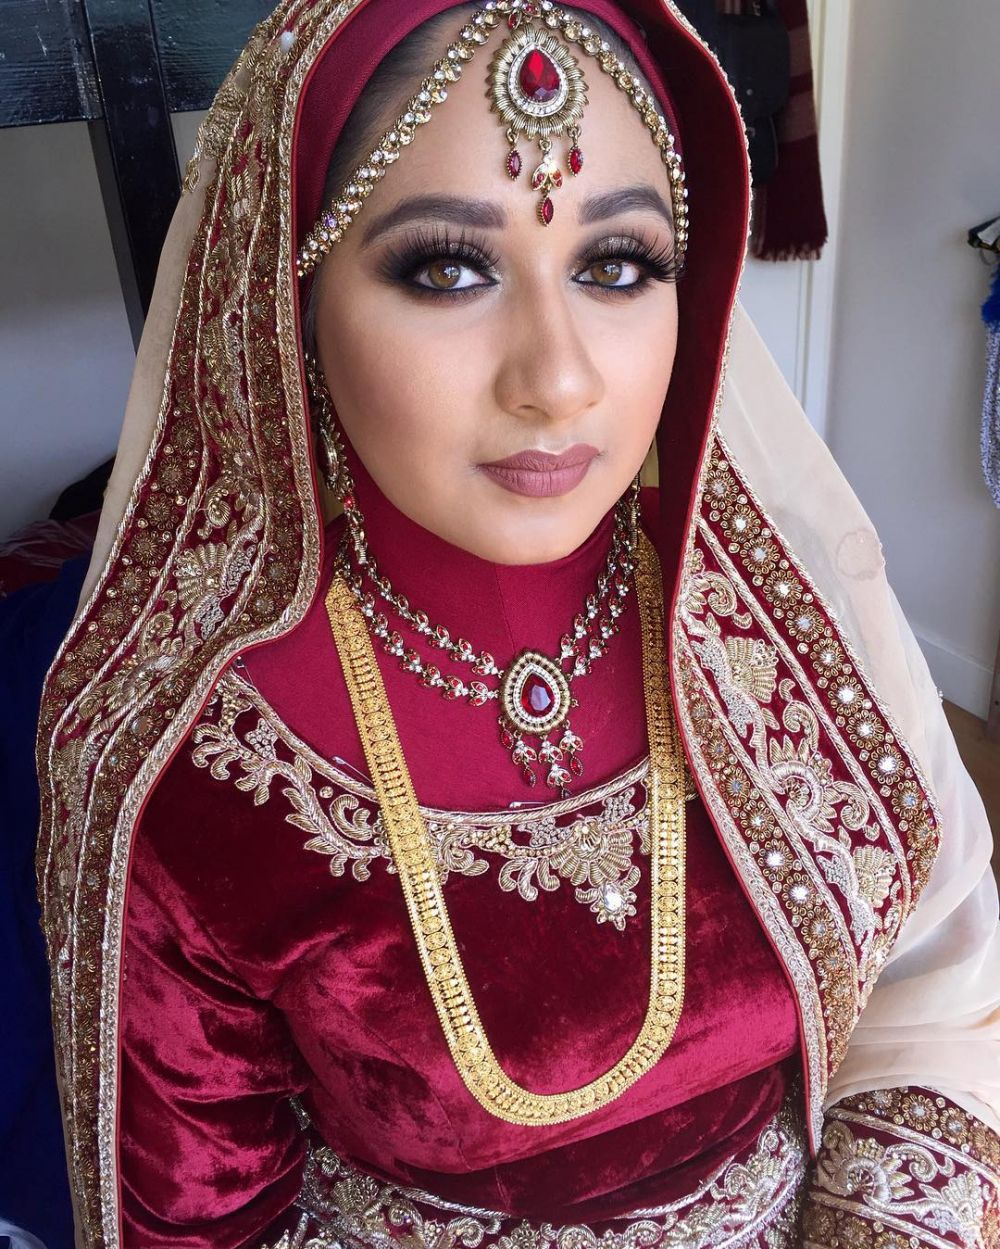 10 Inspirasi riasan pengantin ala India untuk wanita berhijab